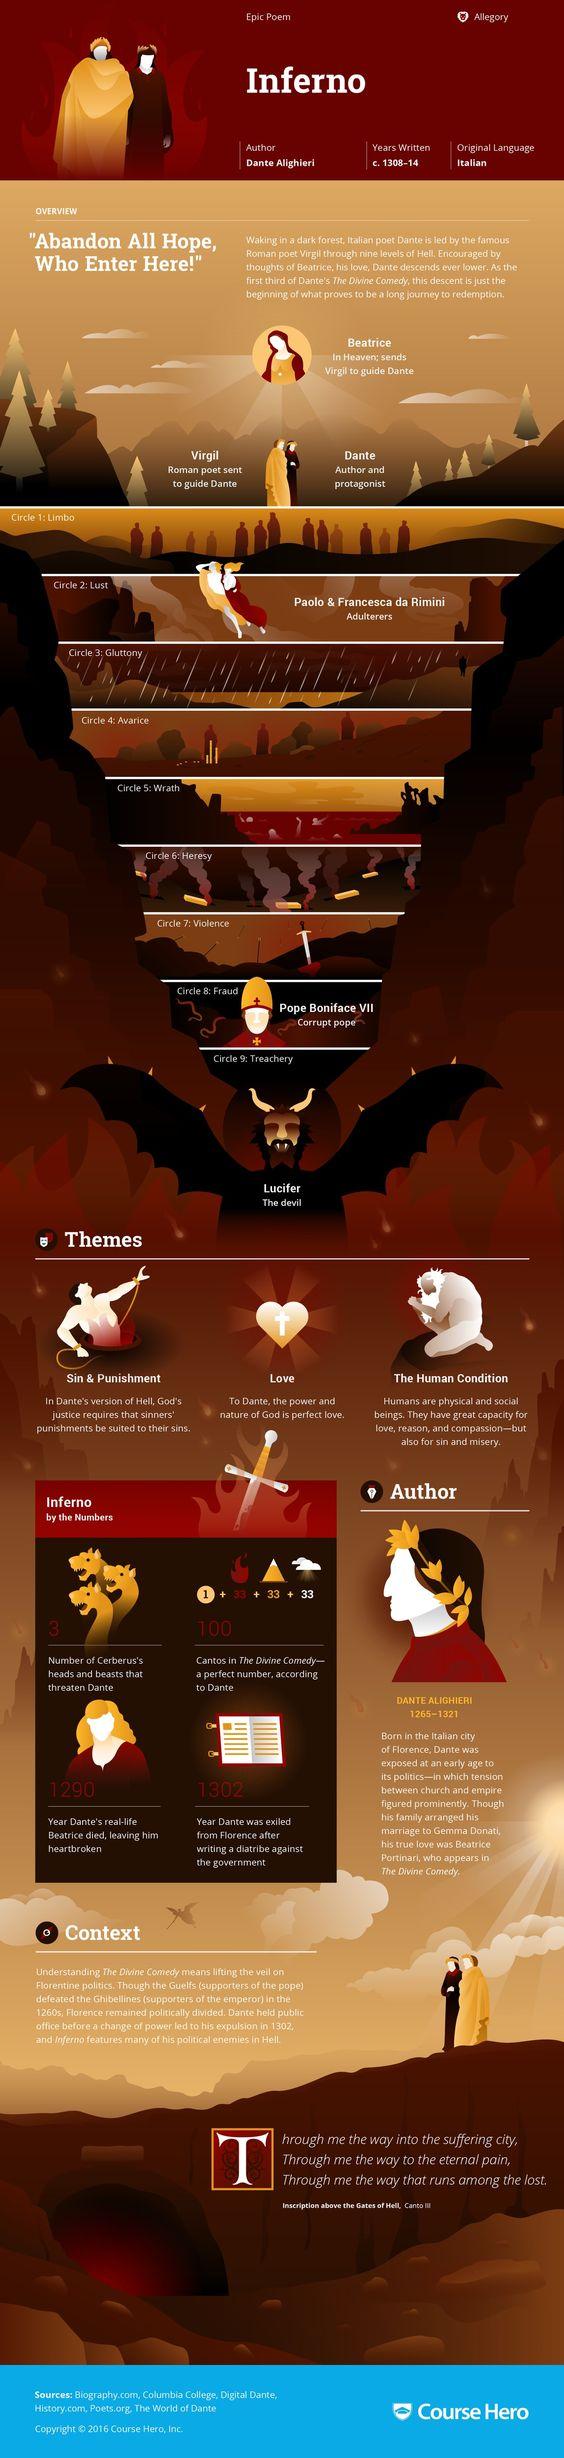 Inferno Infographic | Course Hero